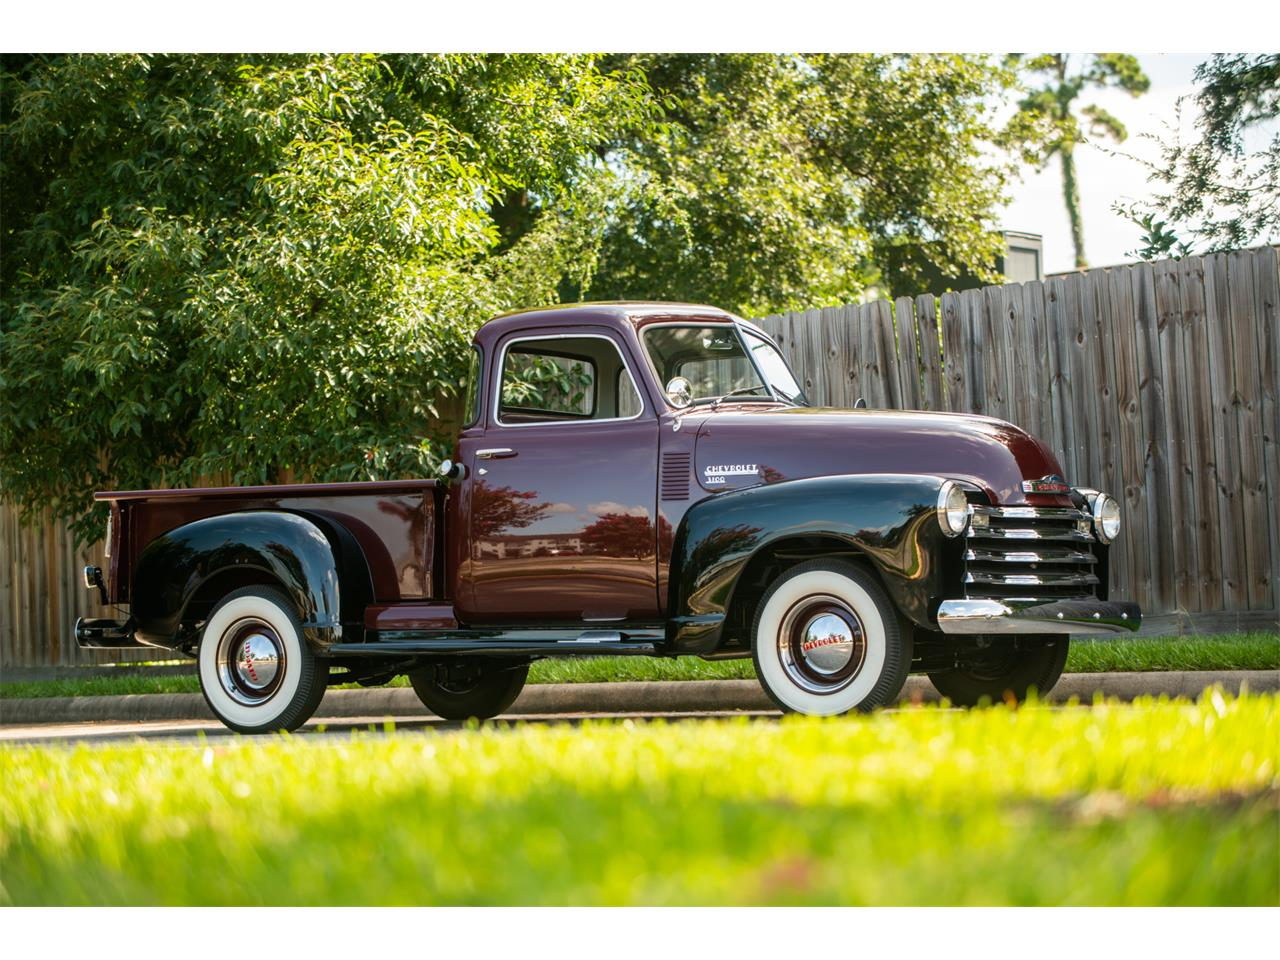 1950 Chevrolet 3100 for Sale | ClassicCars.com | CC-12360121950s Cars For Sale Texas